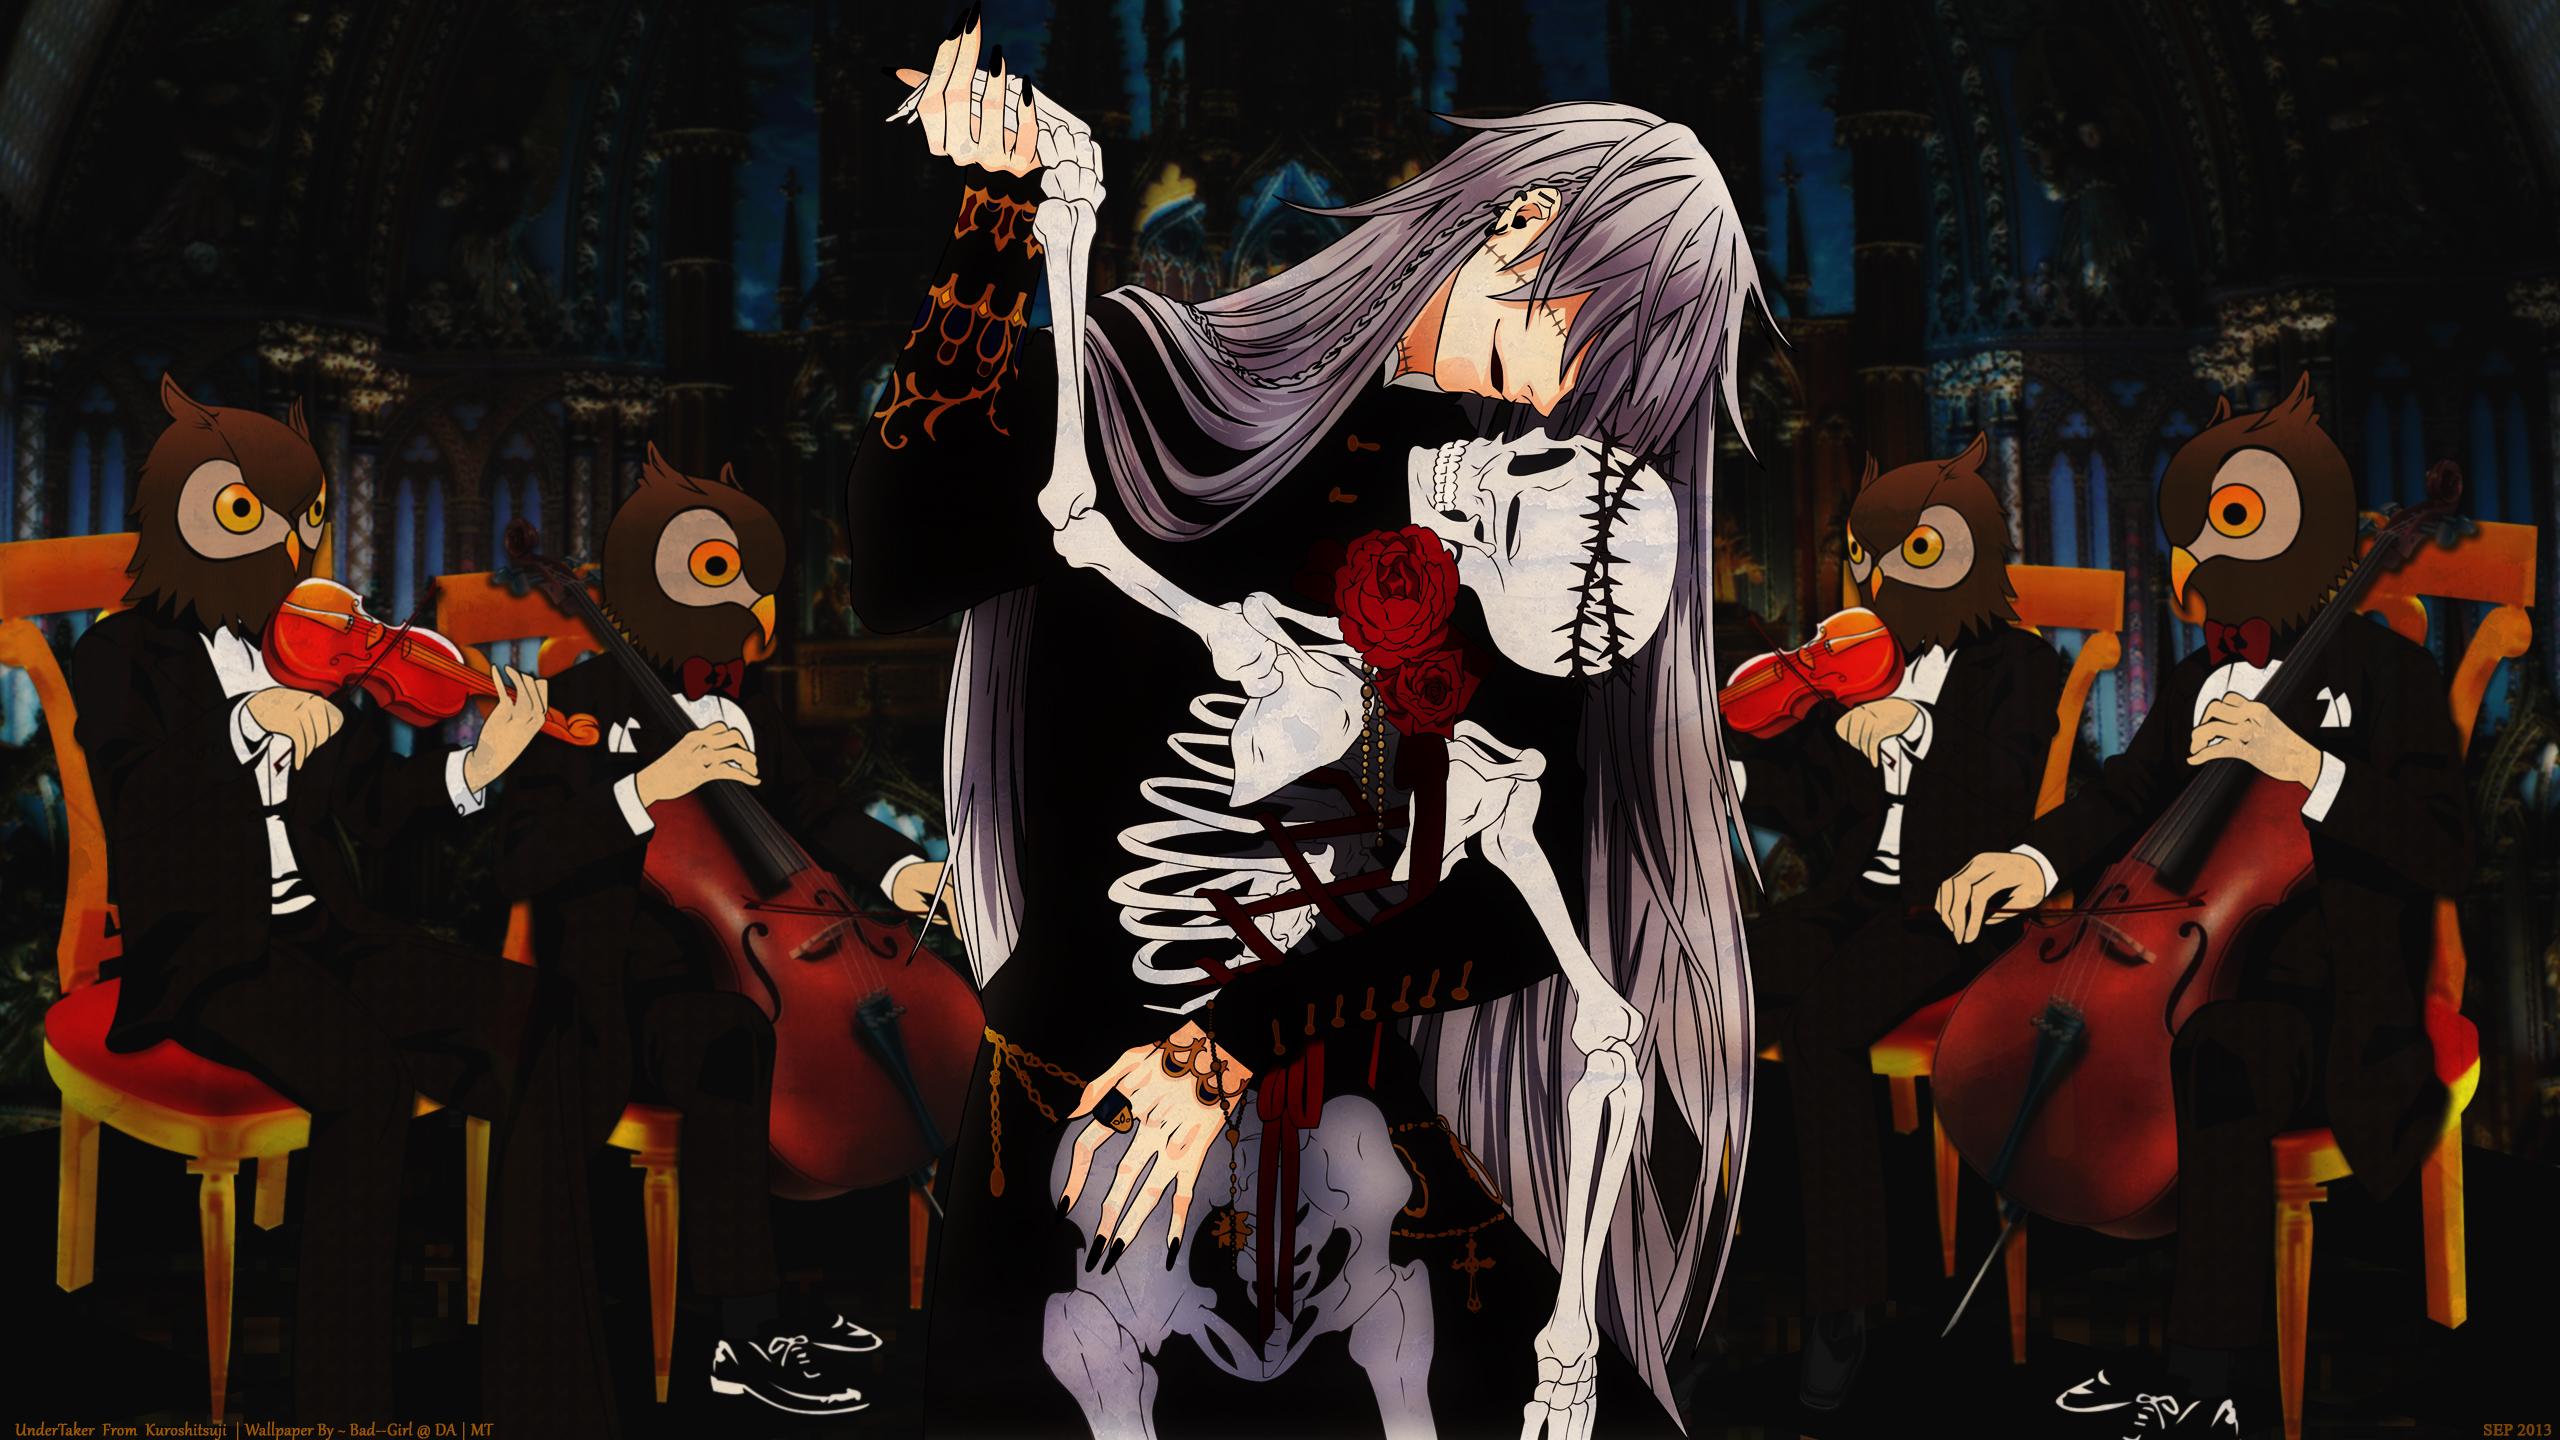 Anime Kuroshitsuji Black Butler Under Taker Musical Theatre Performance Art